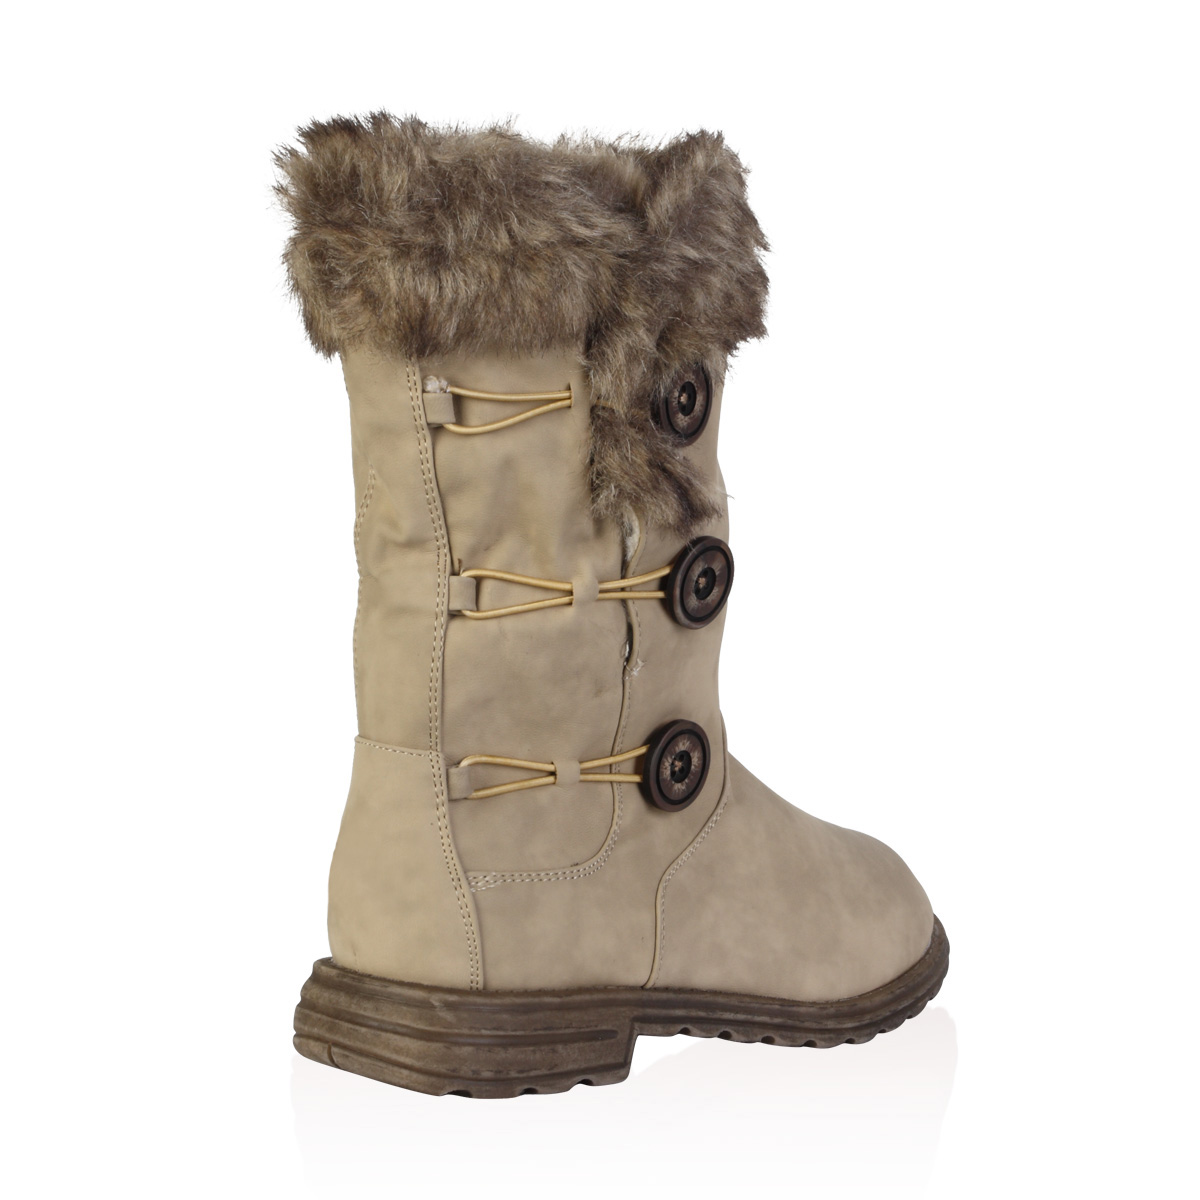 Ladies Soft Faux Fur Lined Womens Button Winter Snow Calf ...